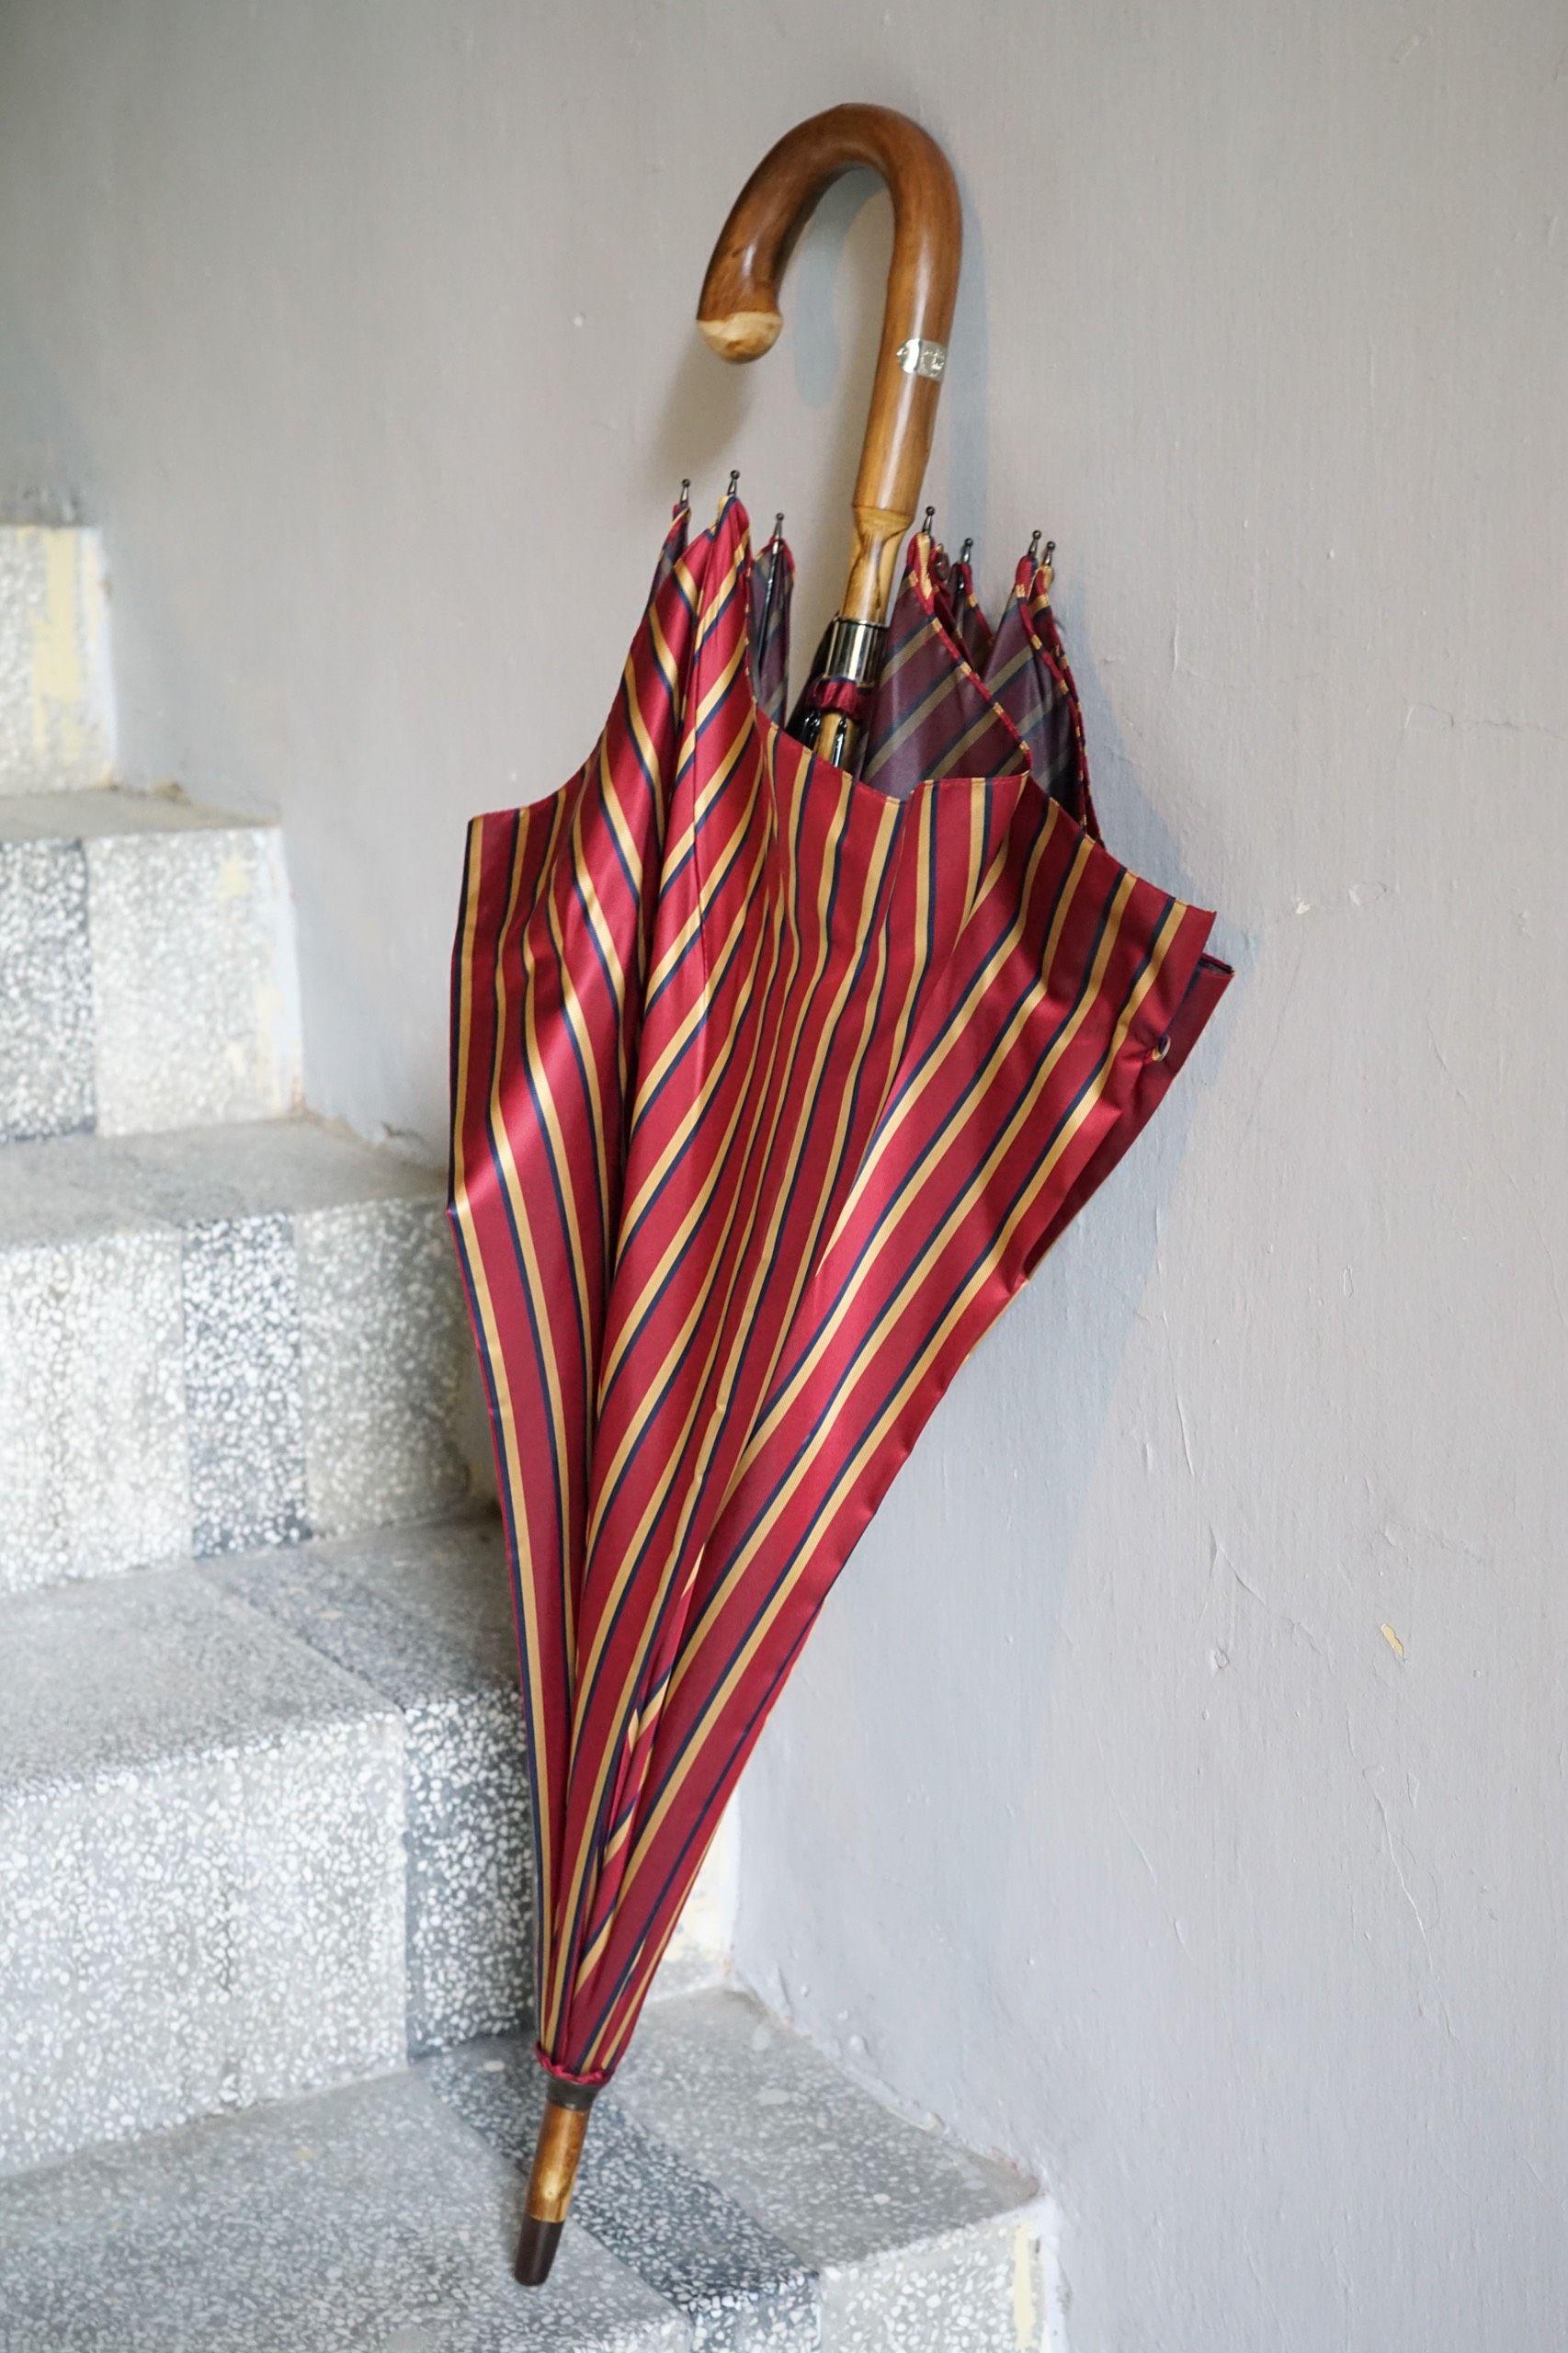 Red Stripe Umbrella with Chestnut Wood handle